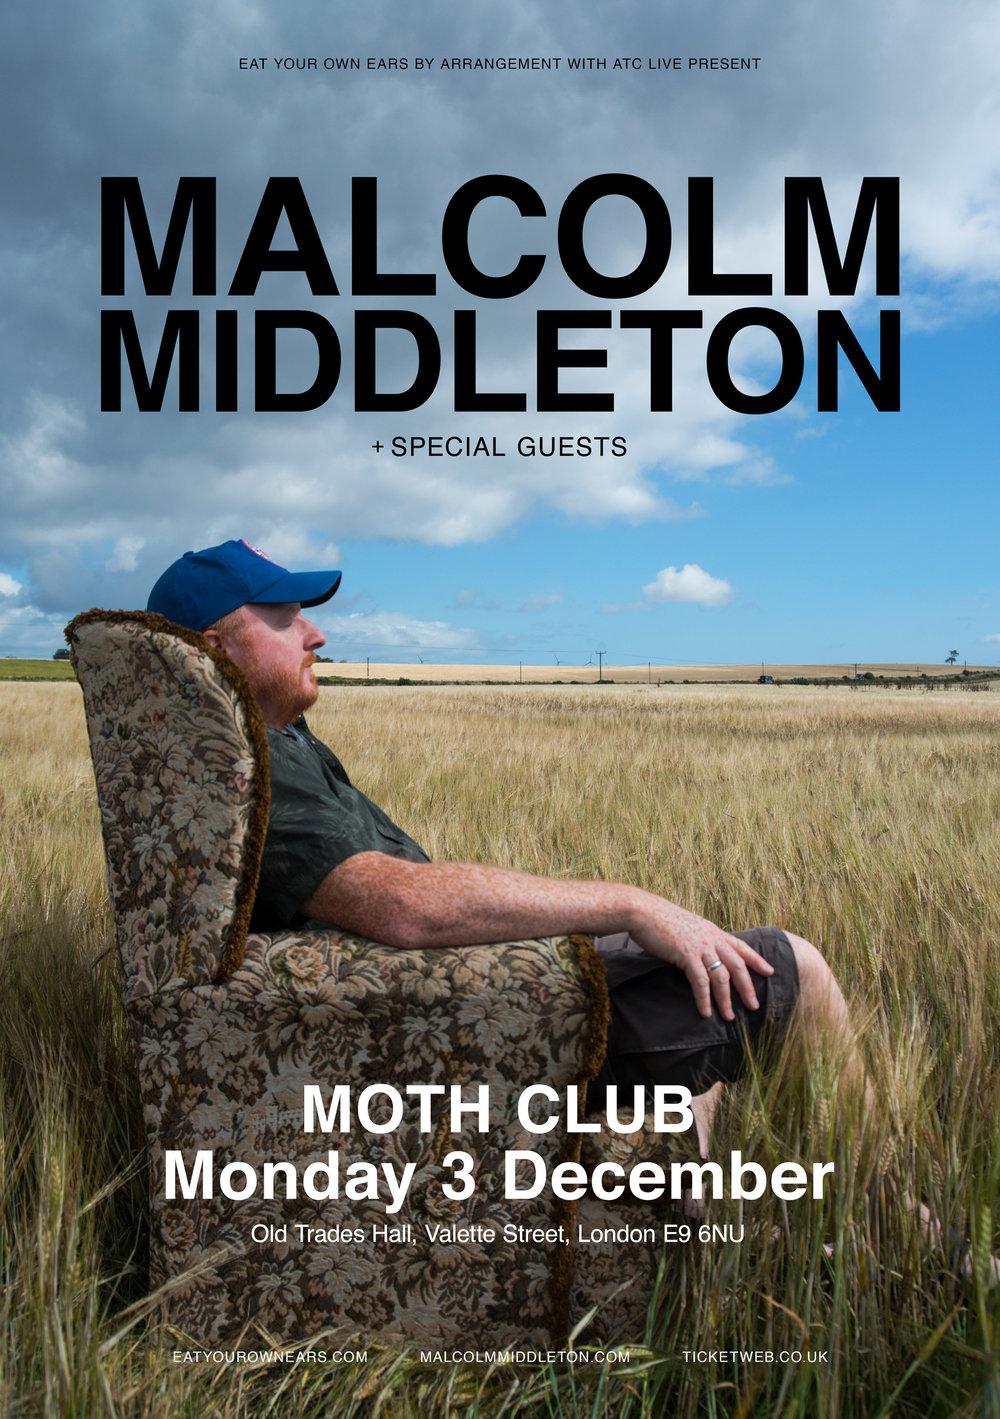 MalcolmMiddleton-Moth-v2.jpg